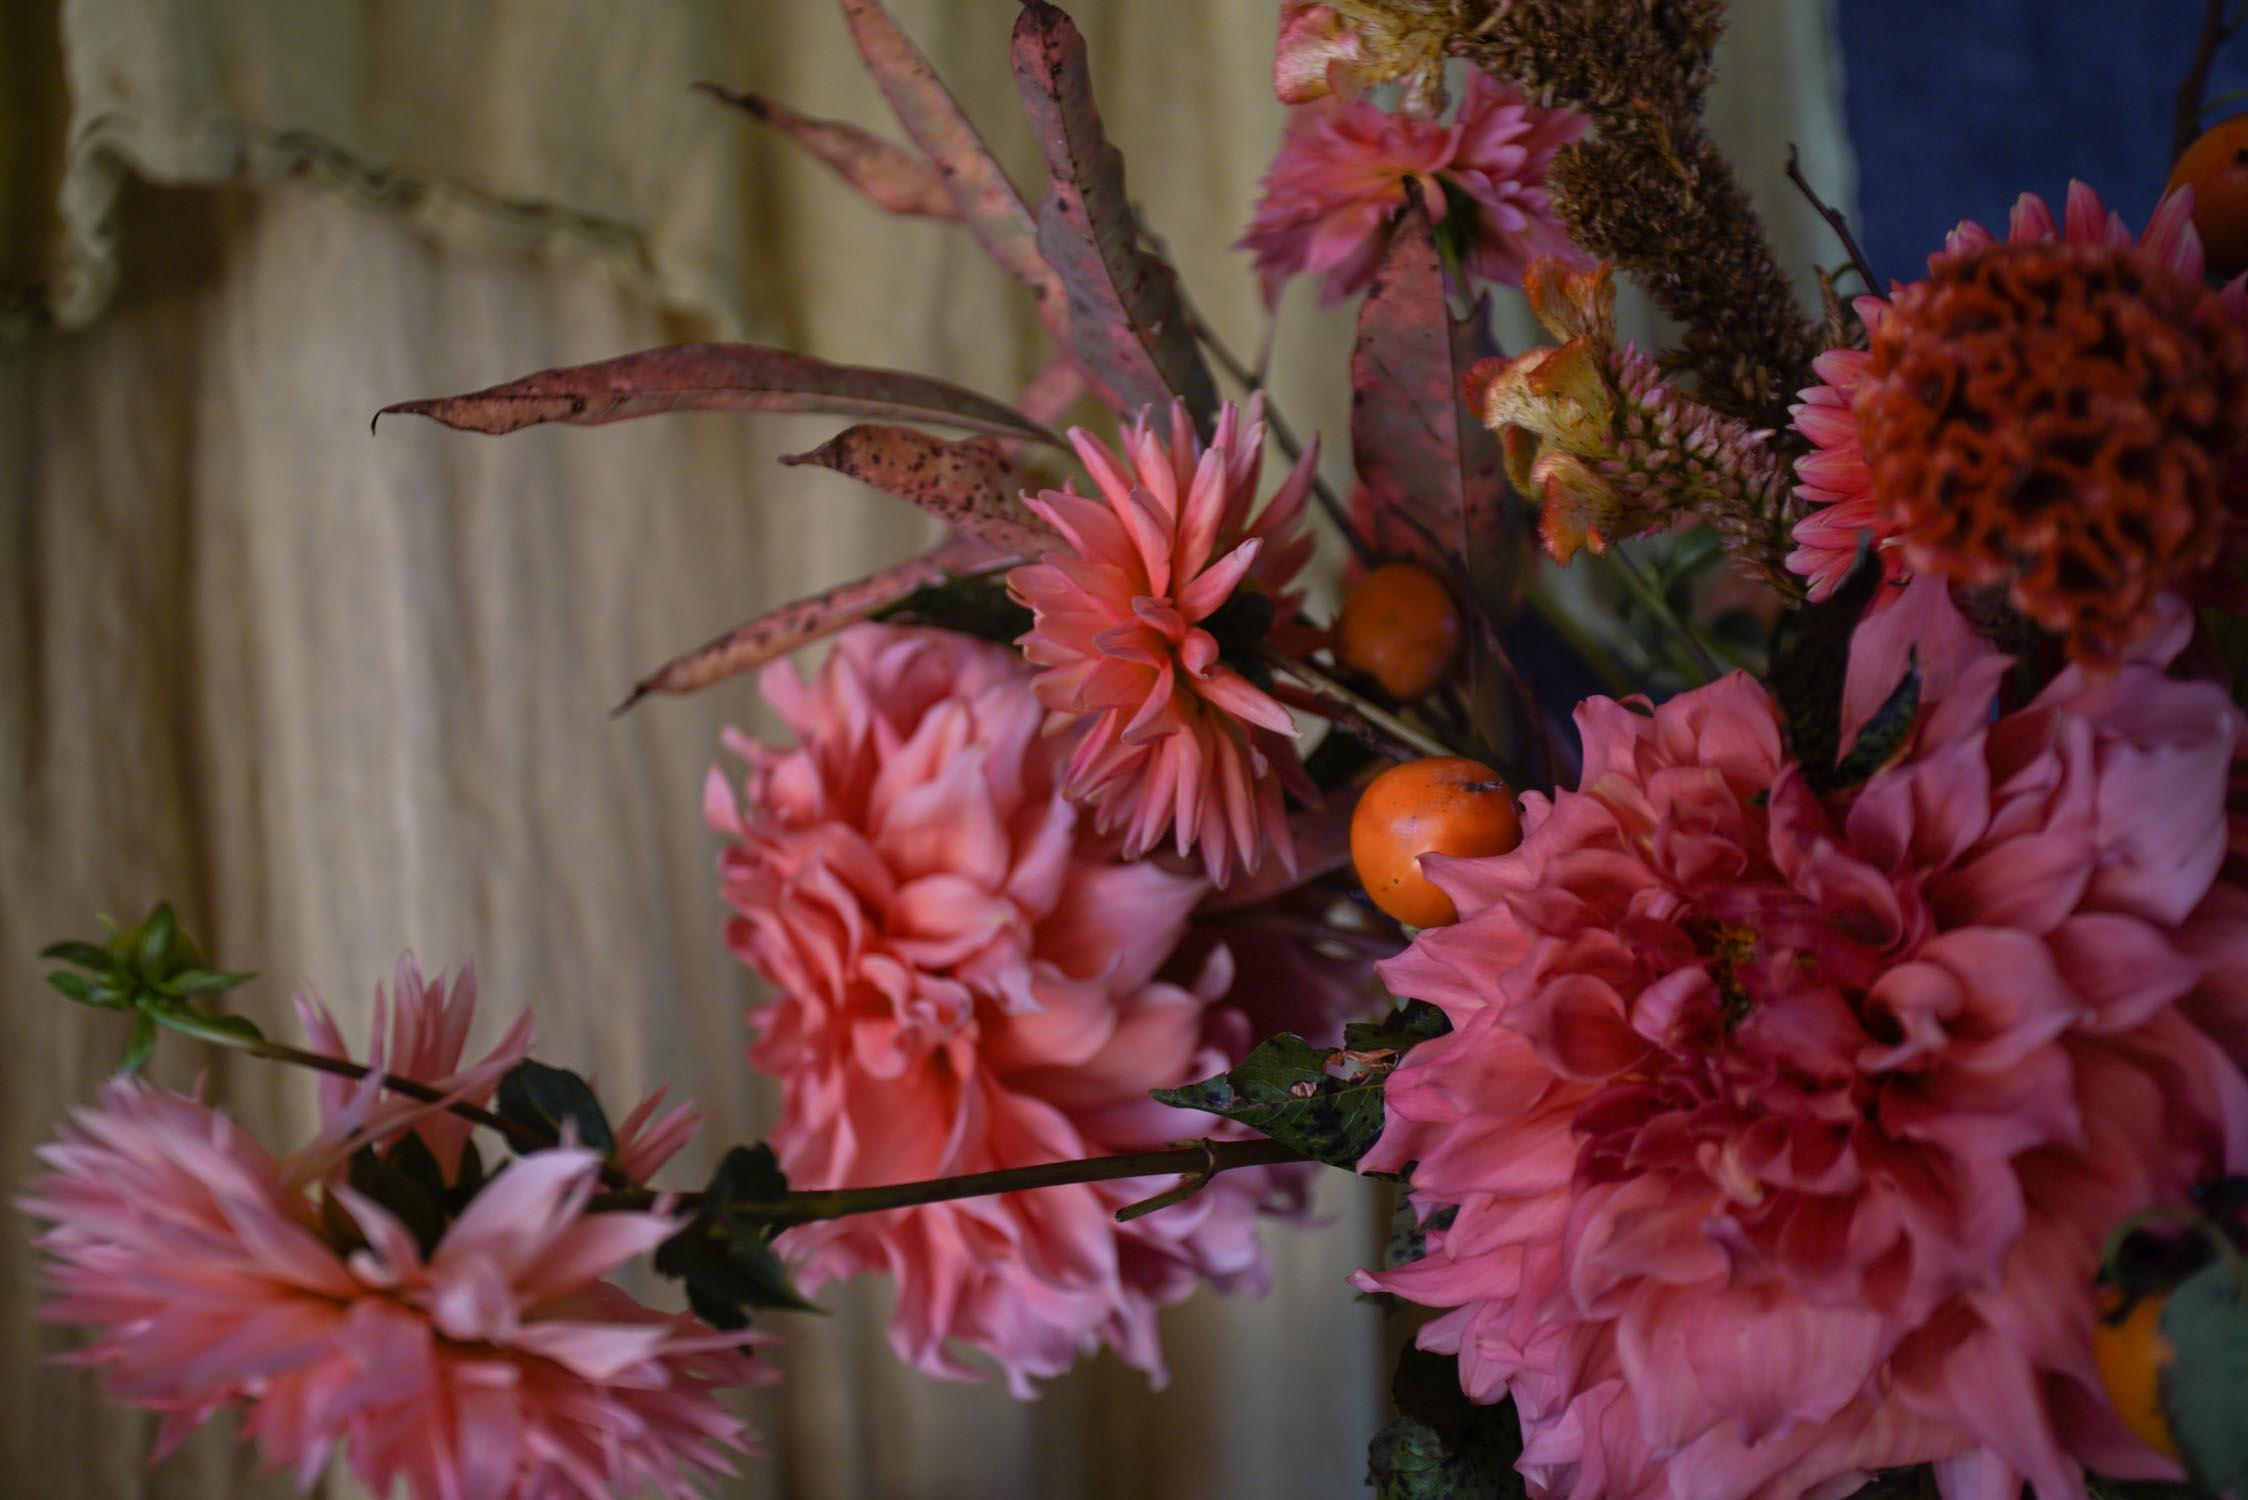 RA_3 porch farm 2016 flower social-2016101709109.jpg